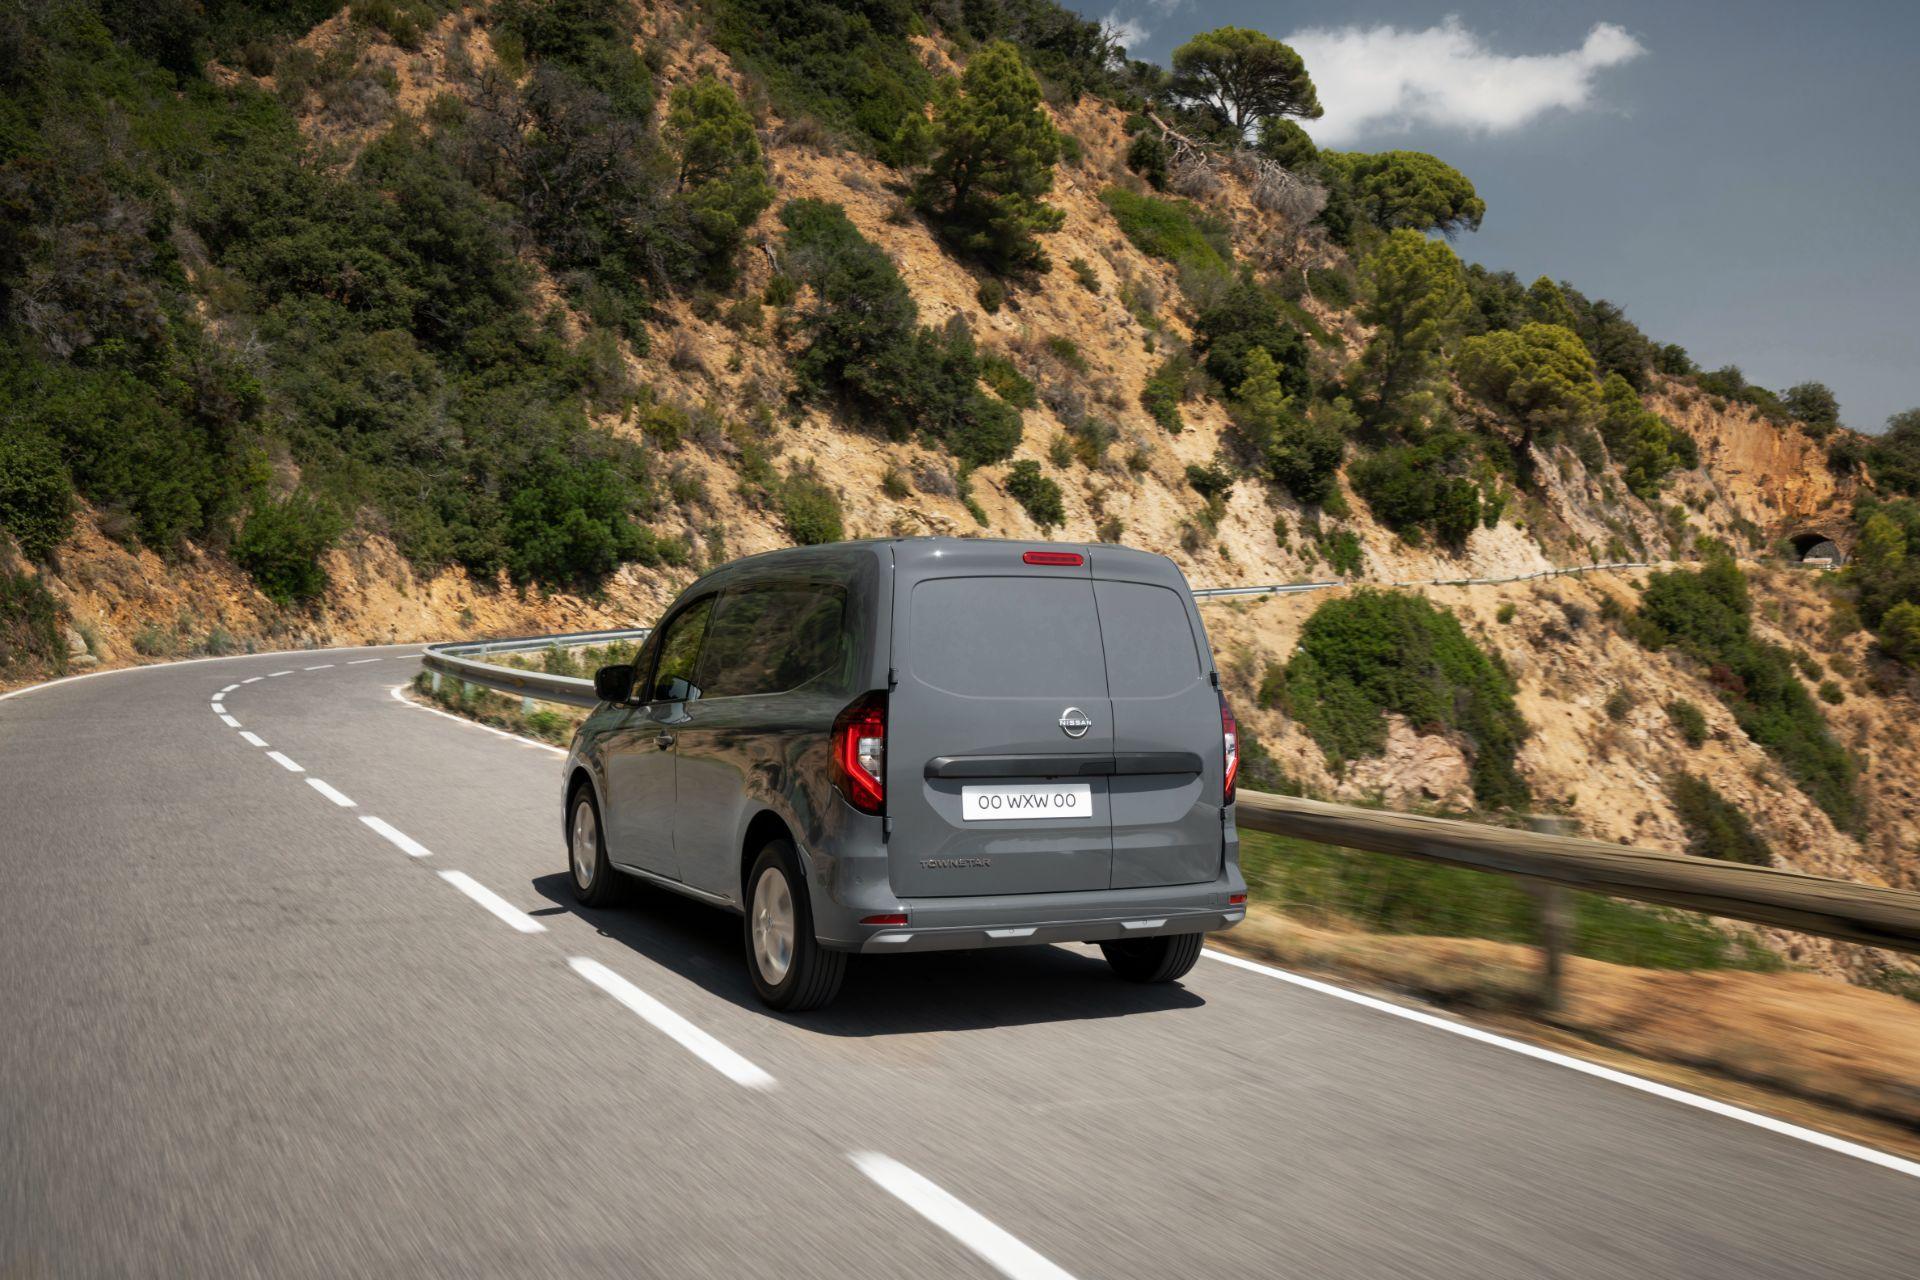 2022-Nissan-Townstar-petrol-van-dynamic-5